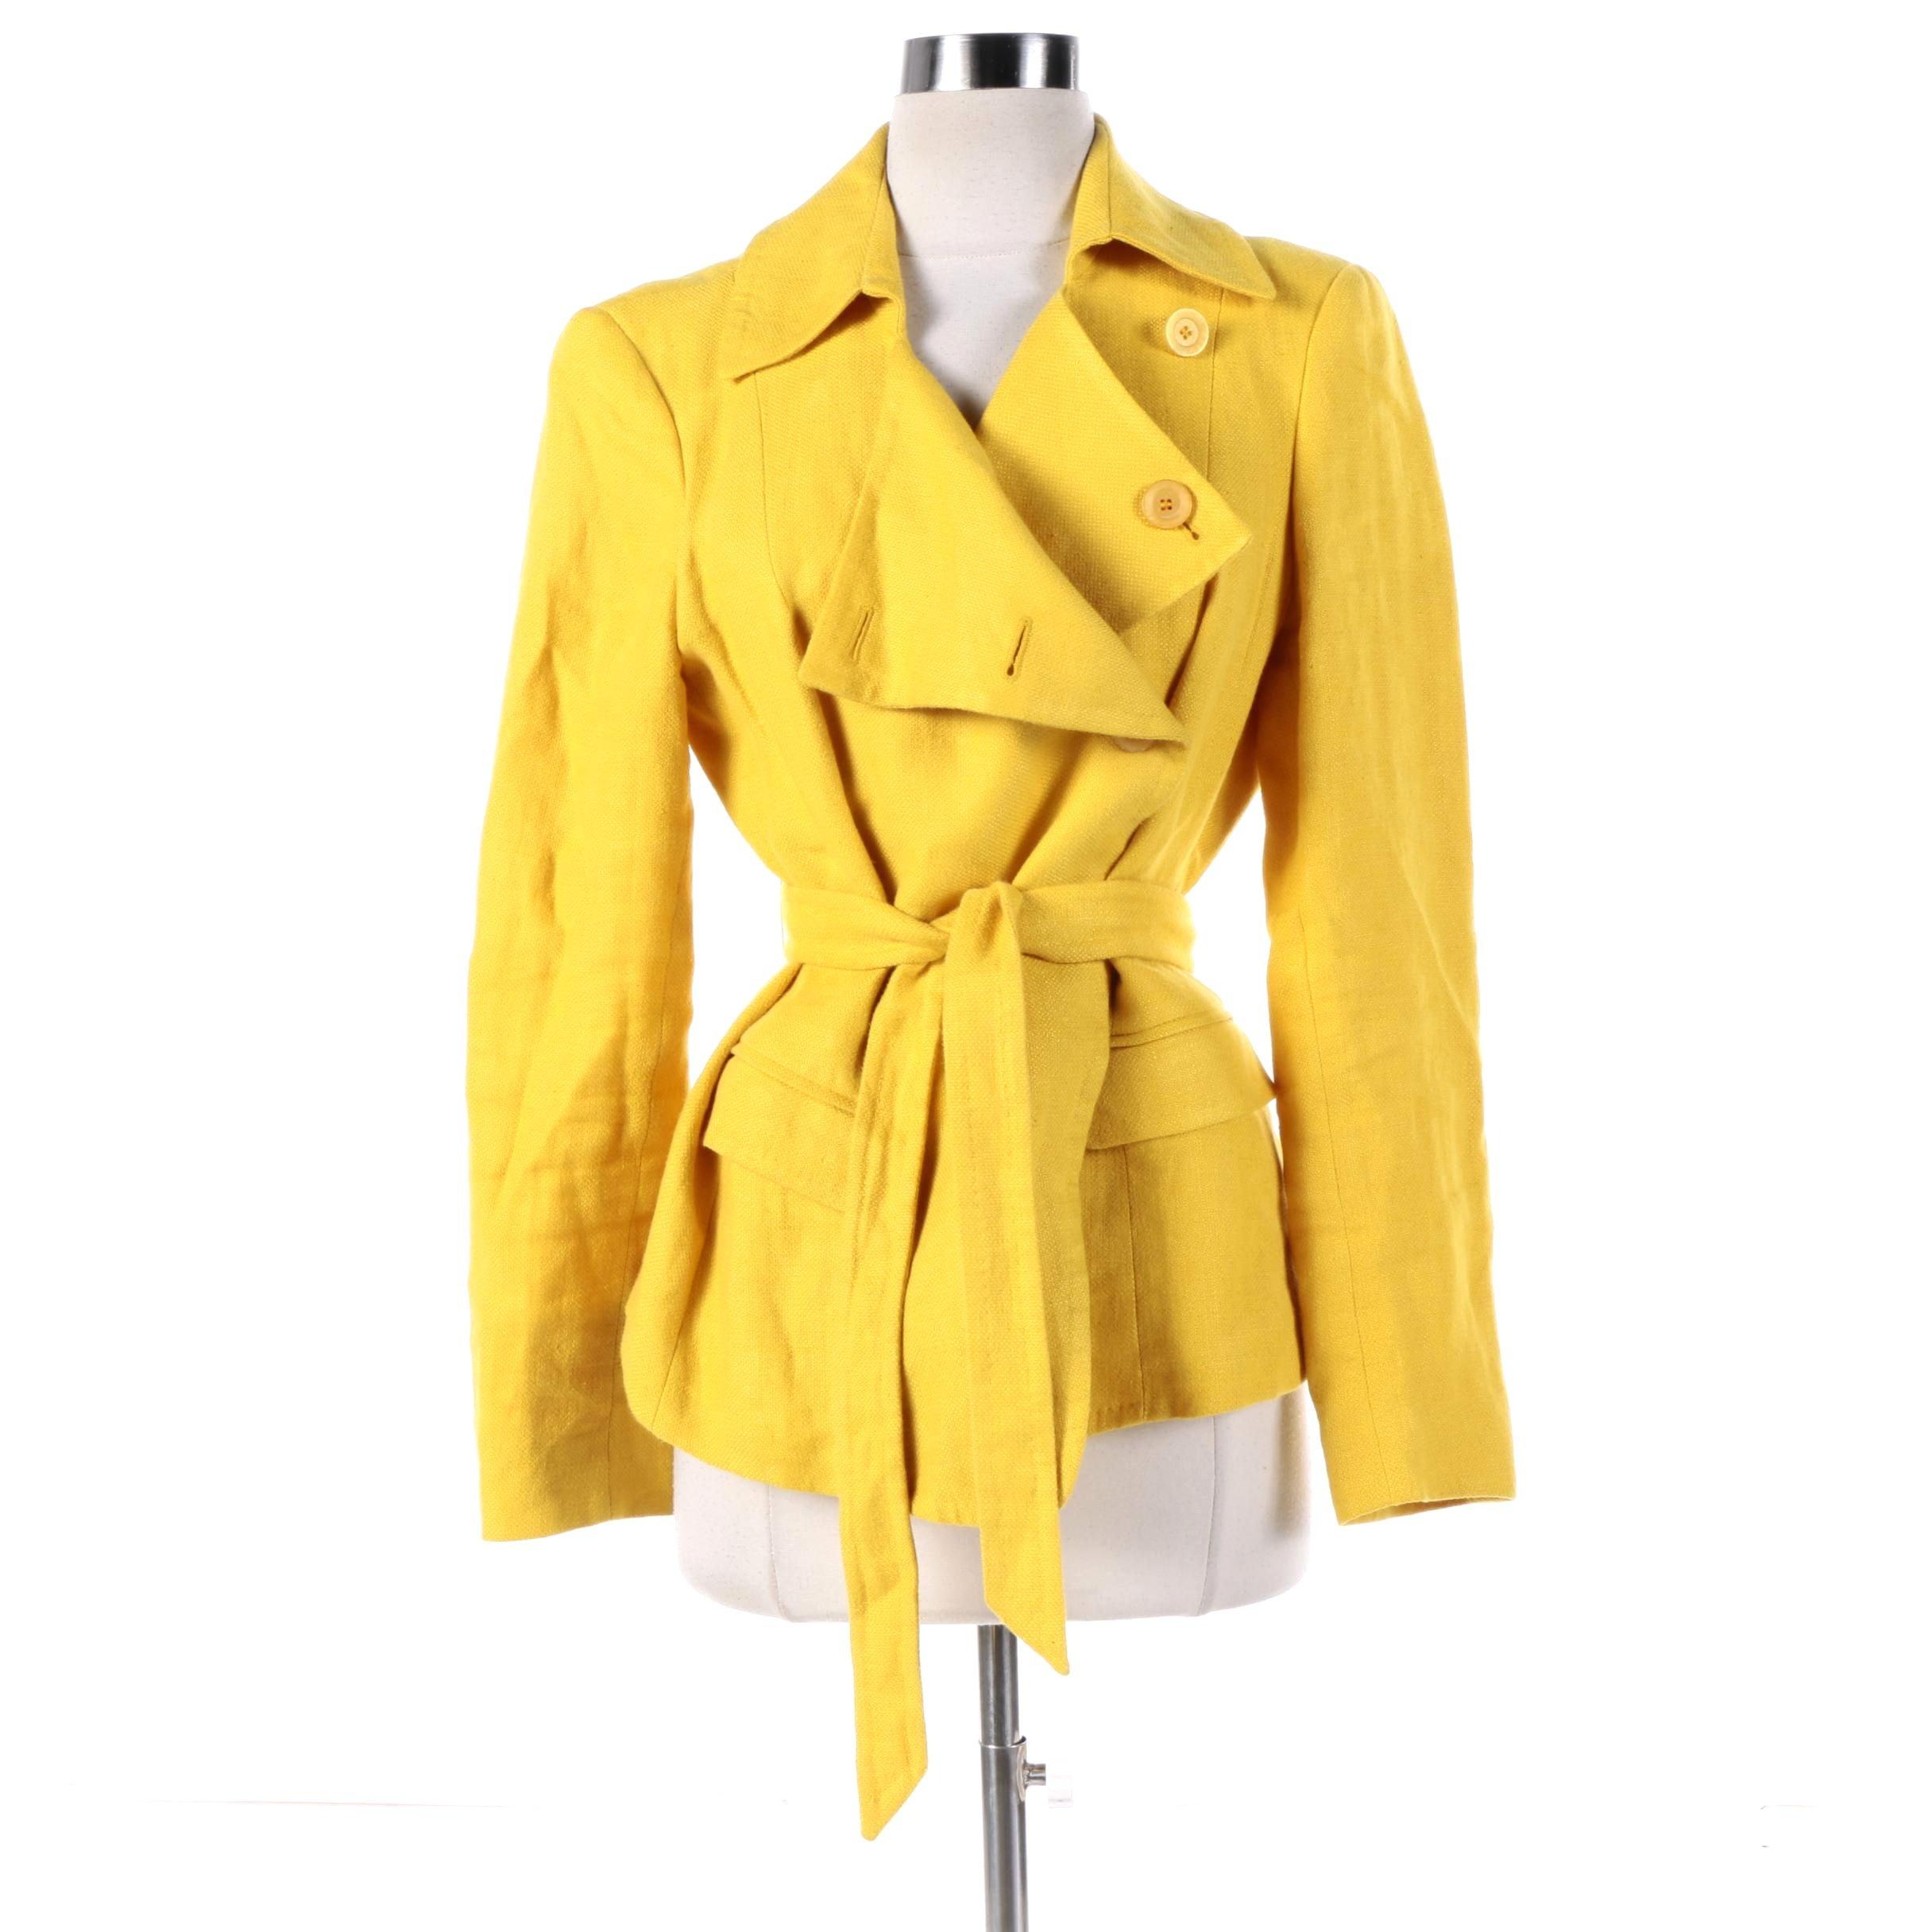 Women's Max Mara Yellow Linen Jacket